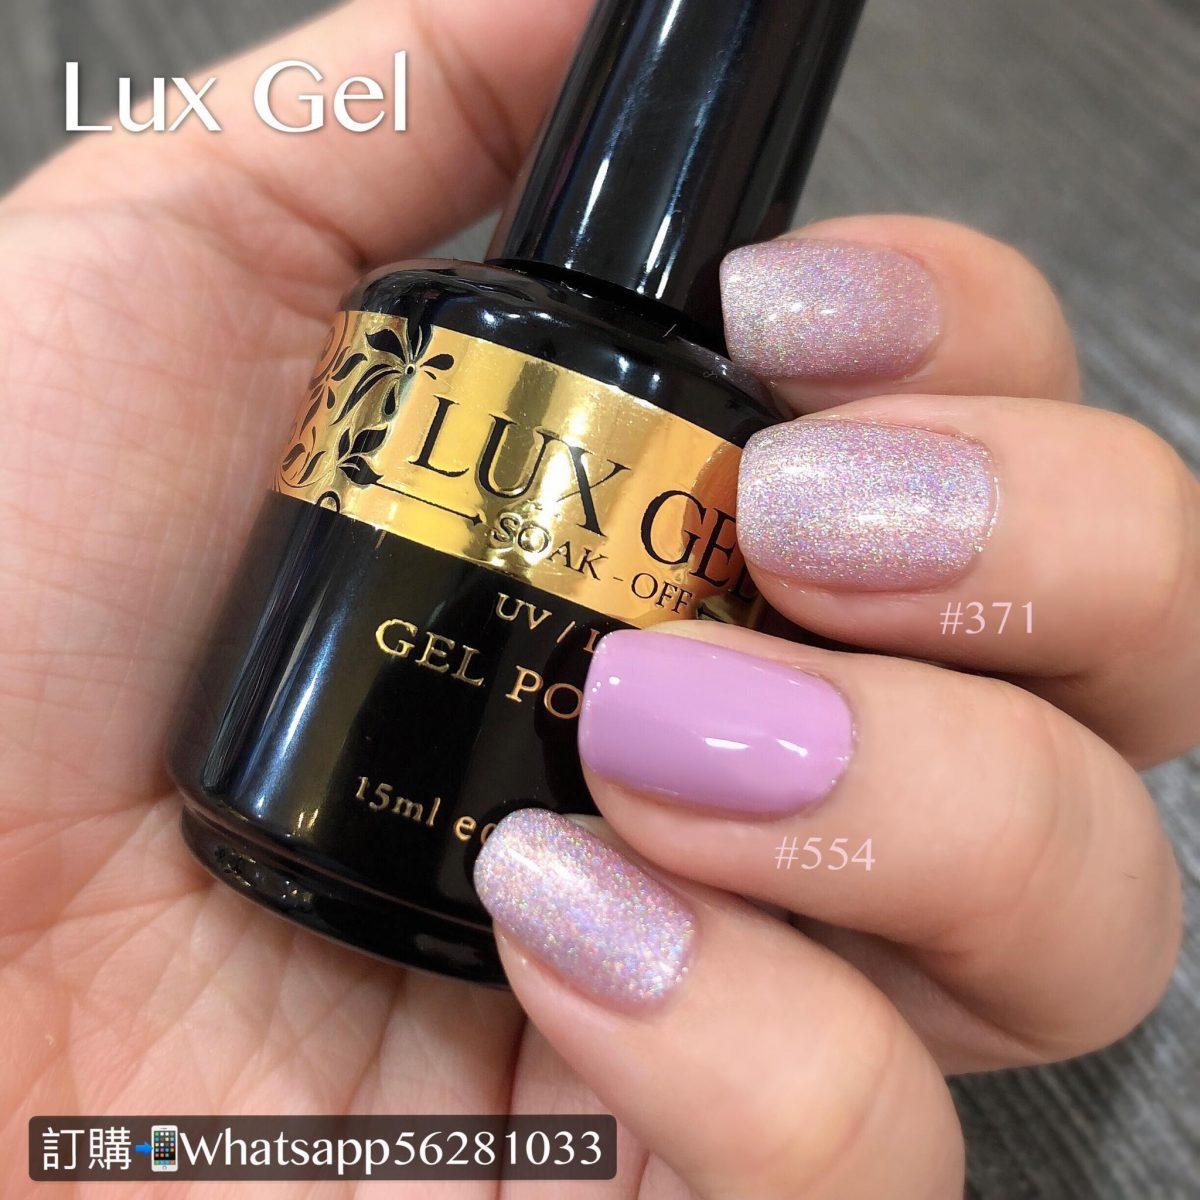 Lux Gel #371